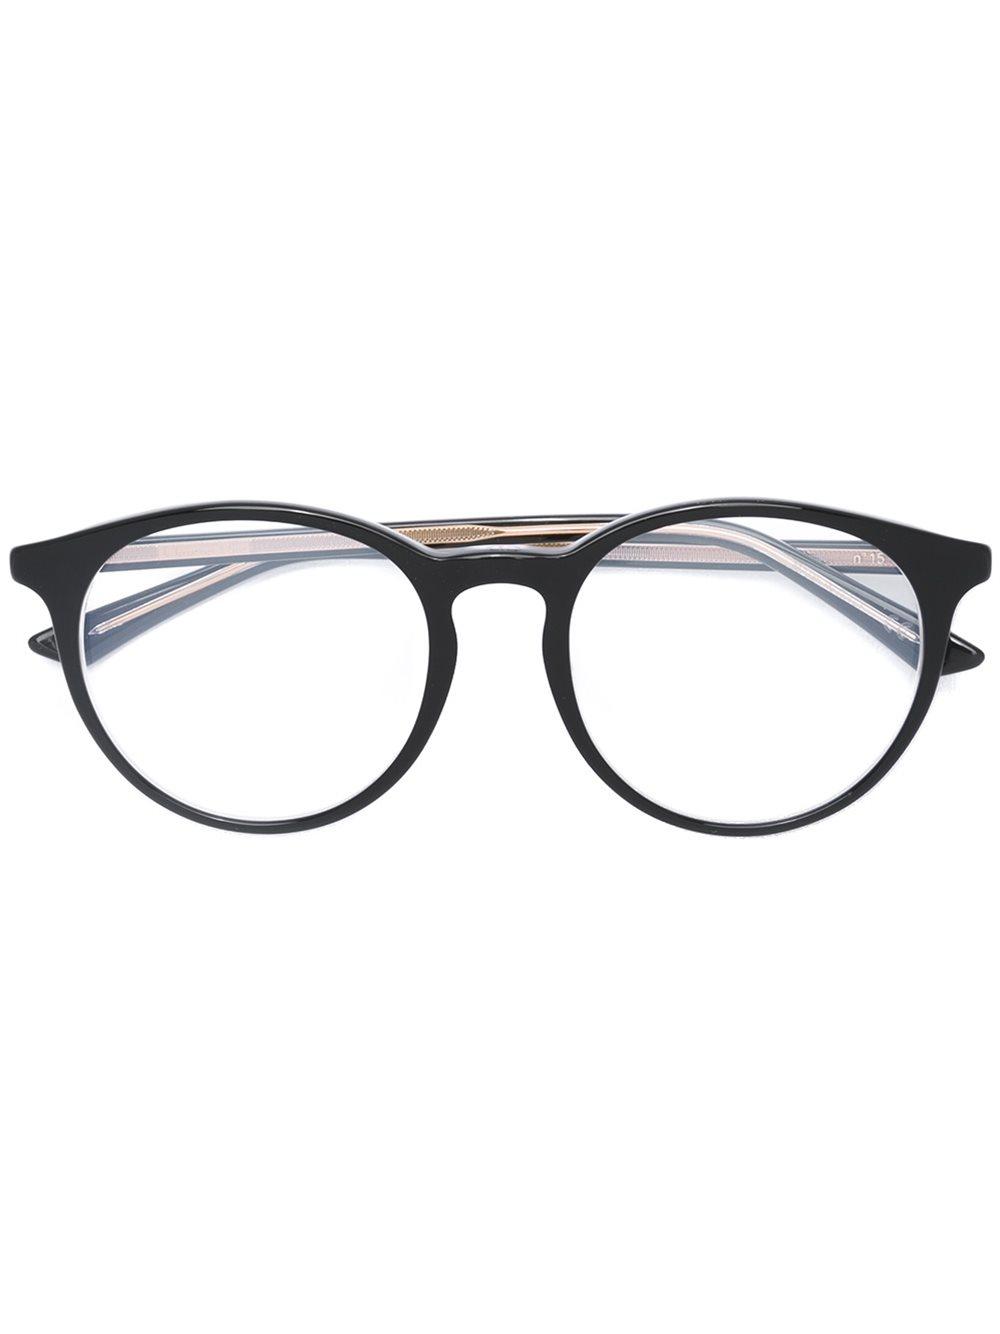 Glasses Frame Dior : Dior Round Frame Glasses in Black Lyst